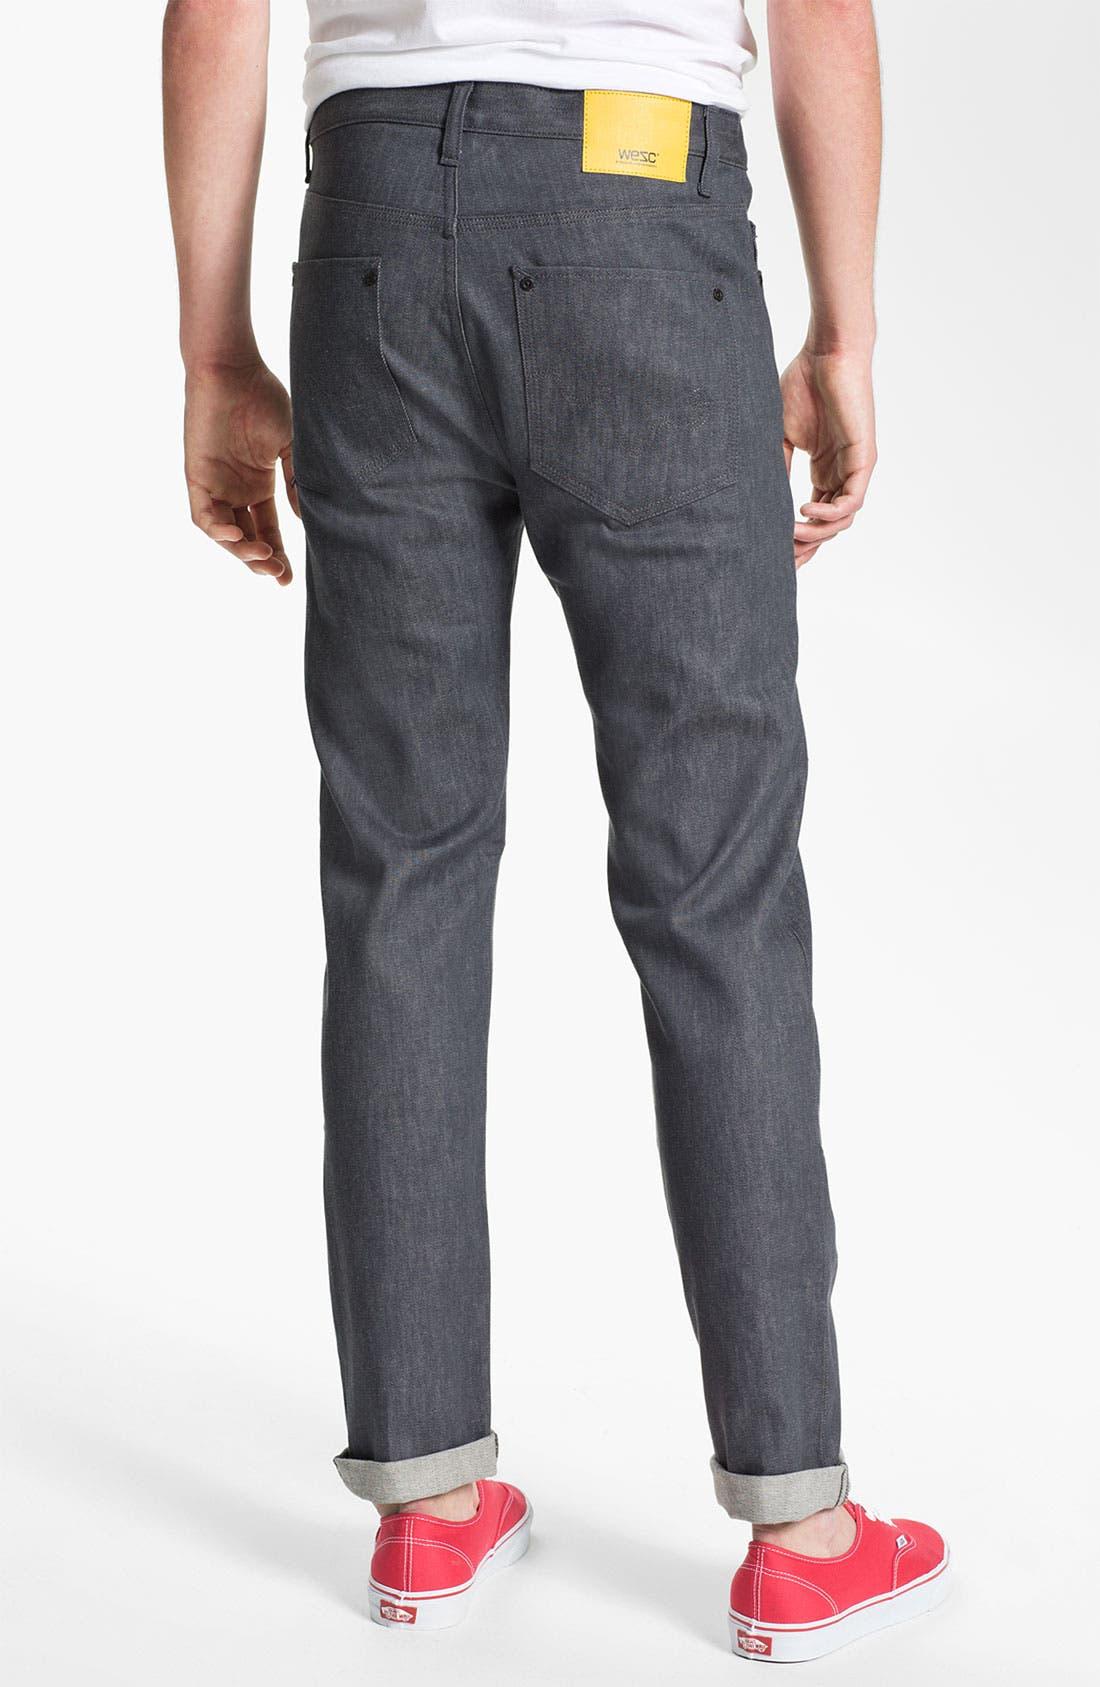 Main Image - WeSC 'Eddy' Slim Fit Jeans (Raw Grey)